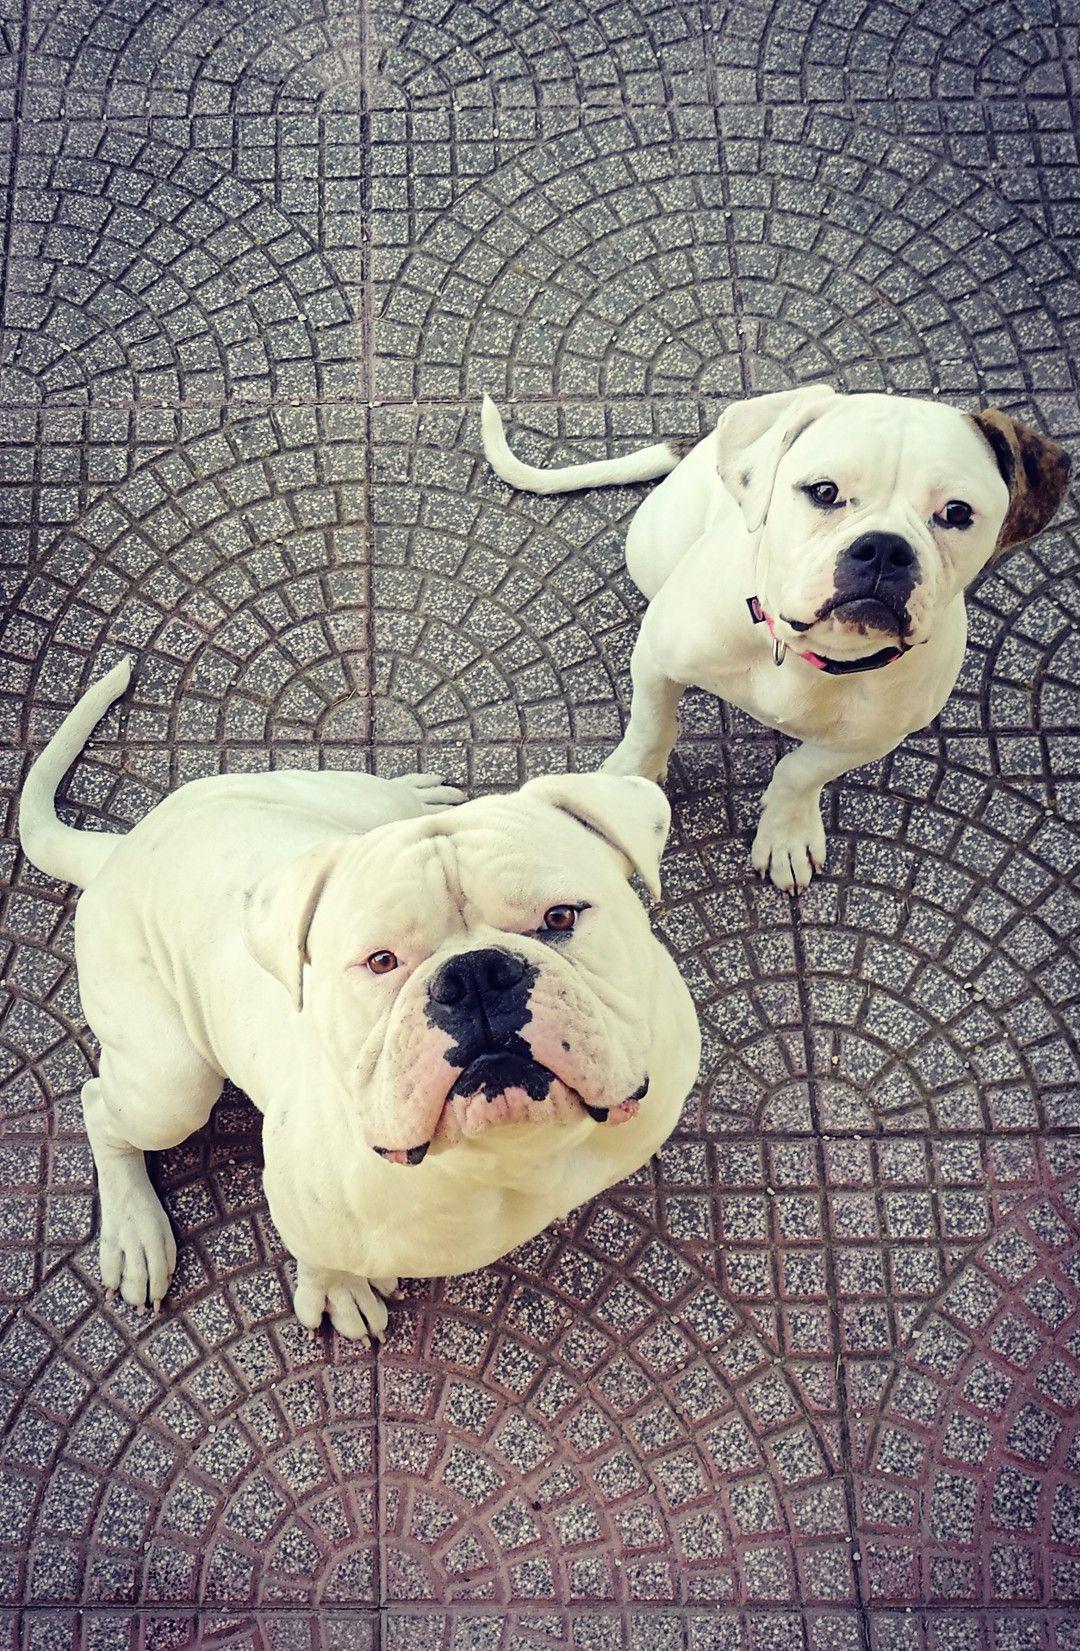 Lp S Sem Lp S Chanel Huge Dogs American Bulldog Beautiful Dogs